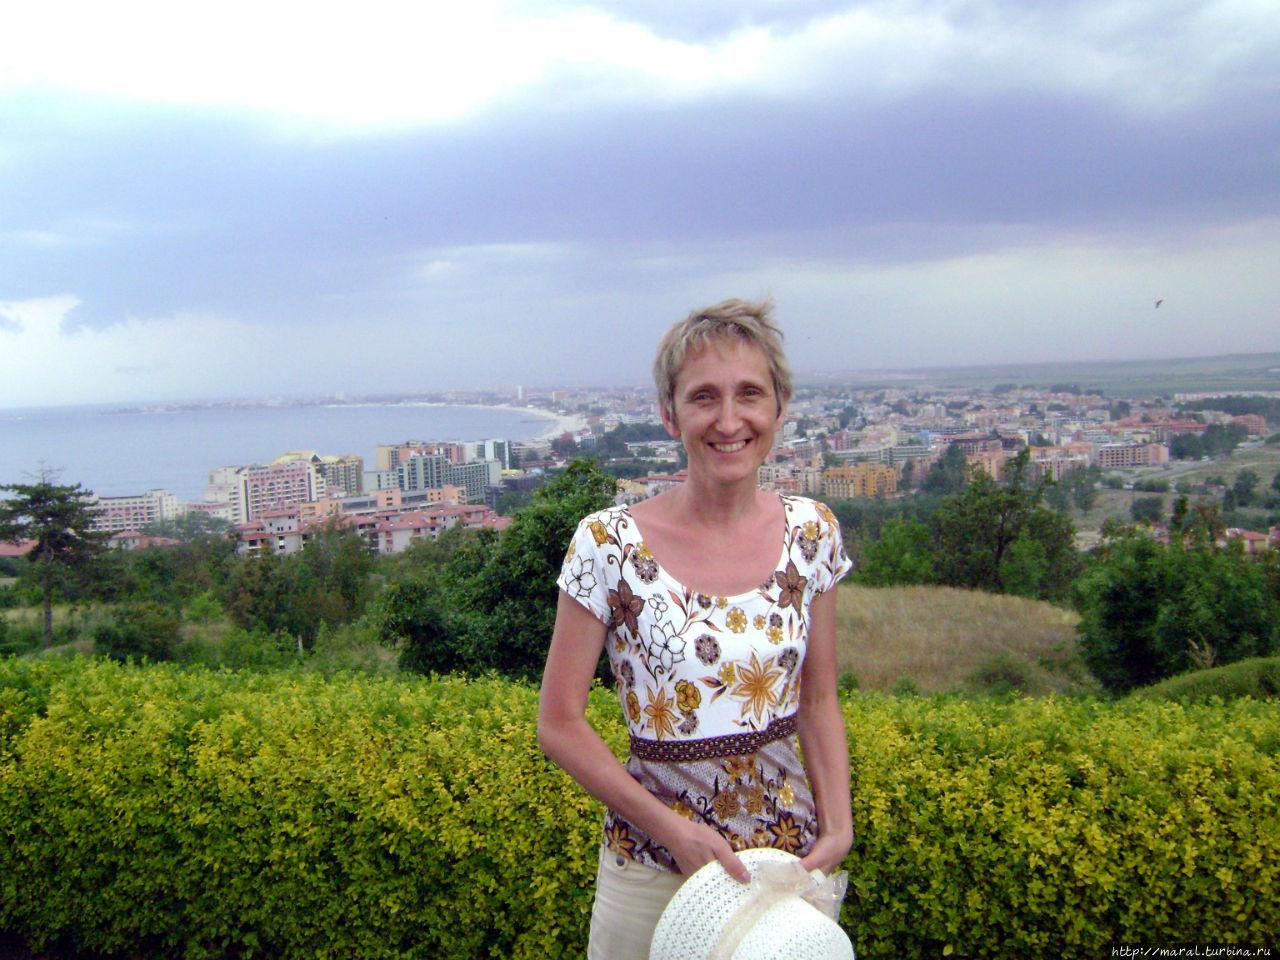 Из Болгарии — с улыбкой